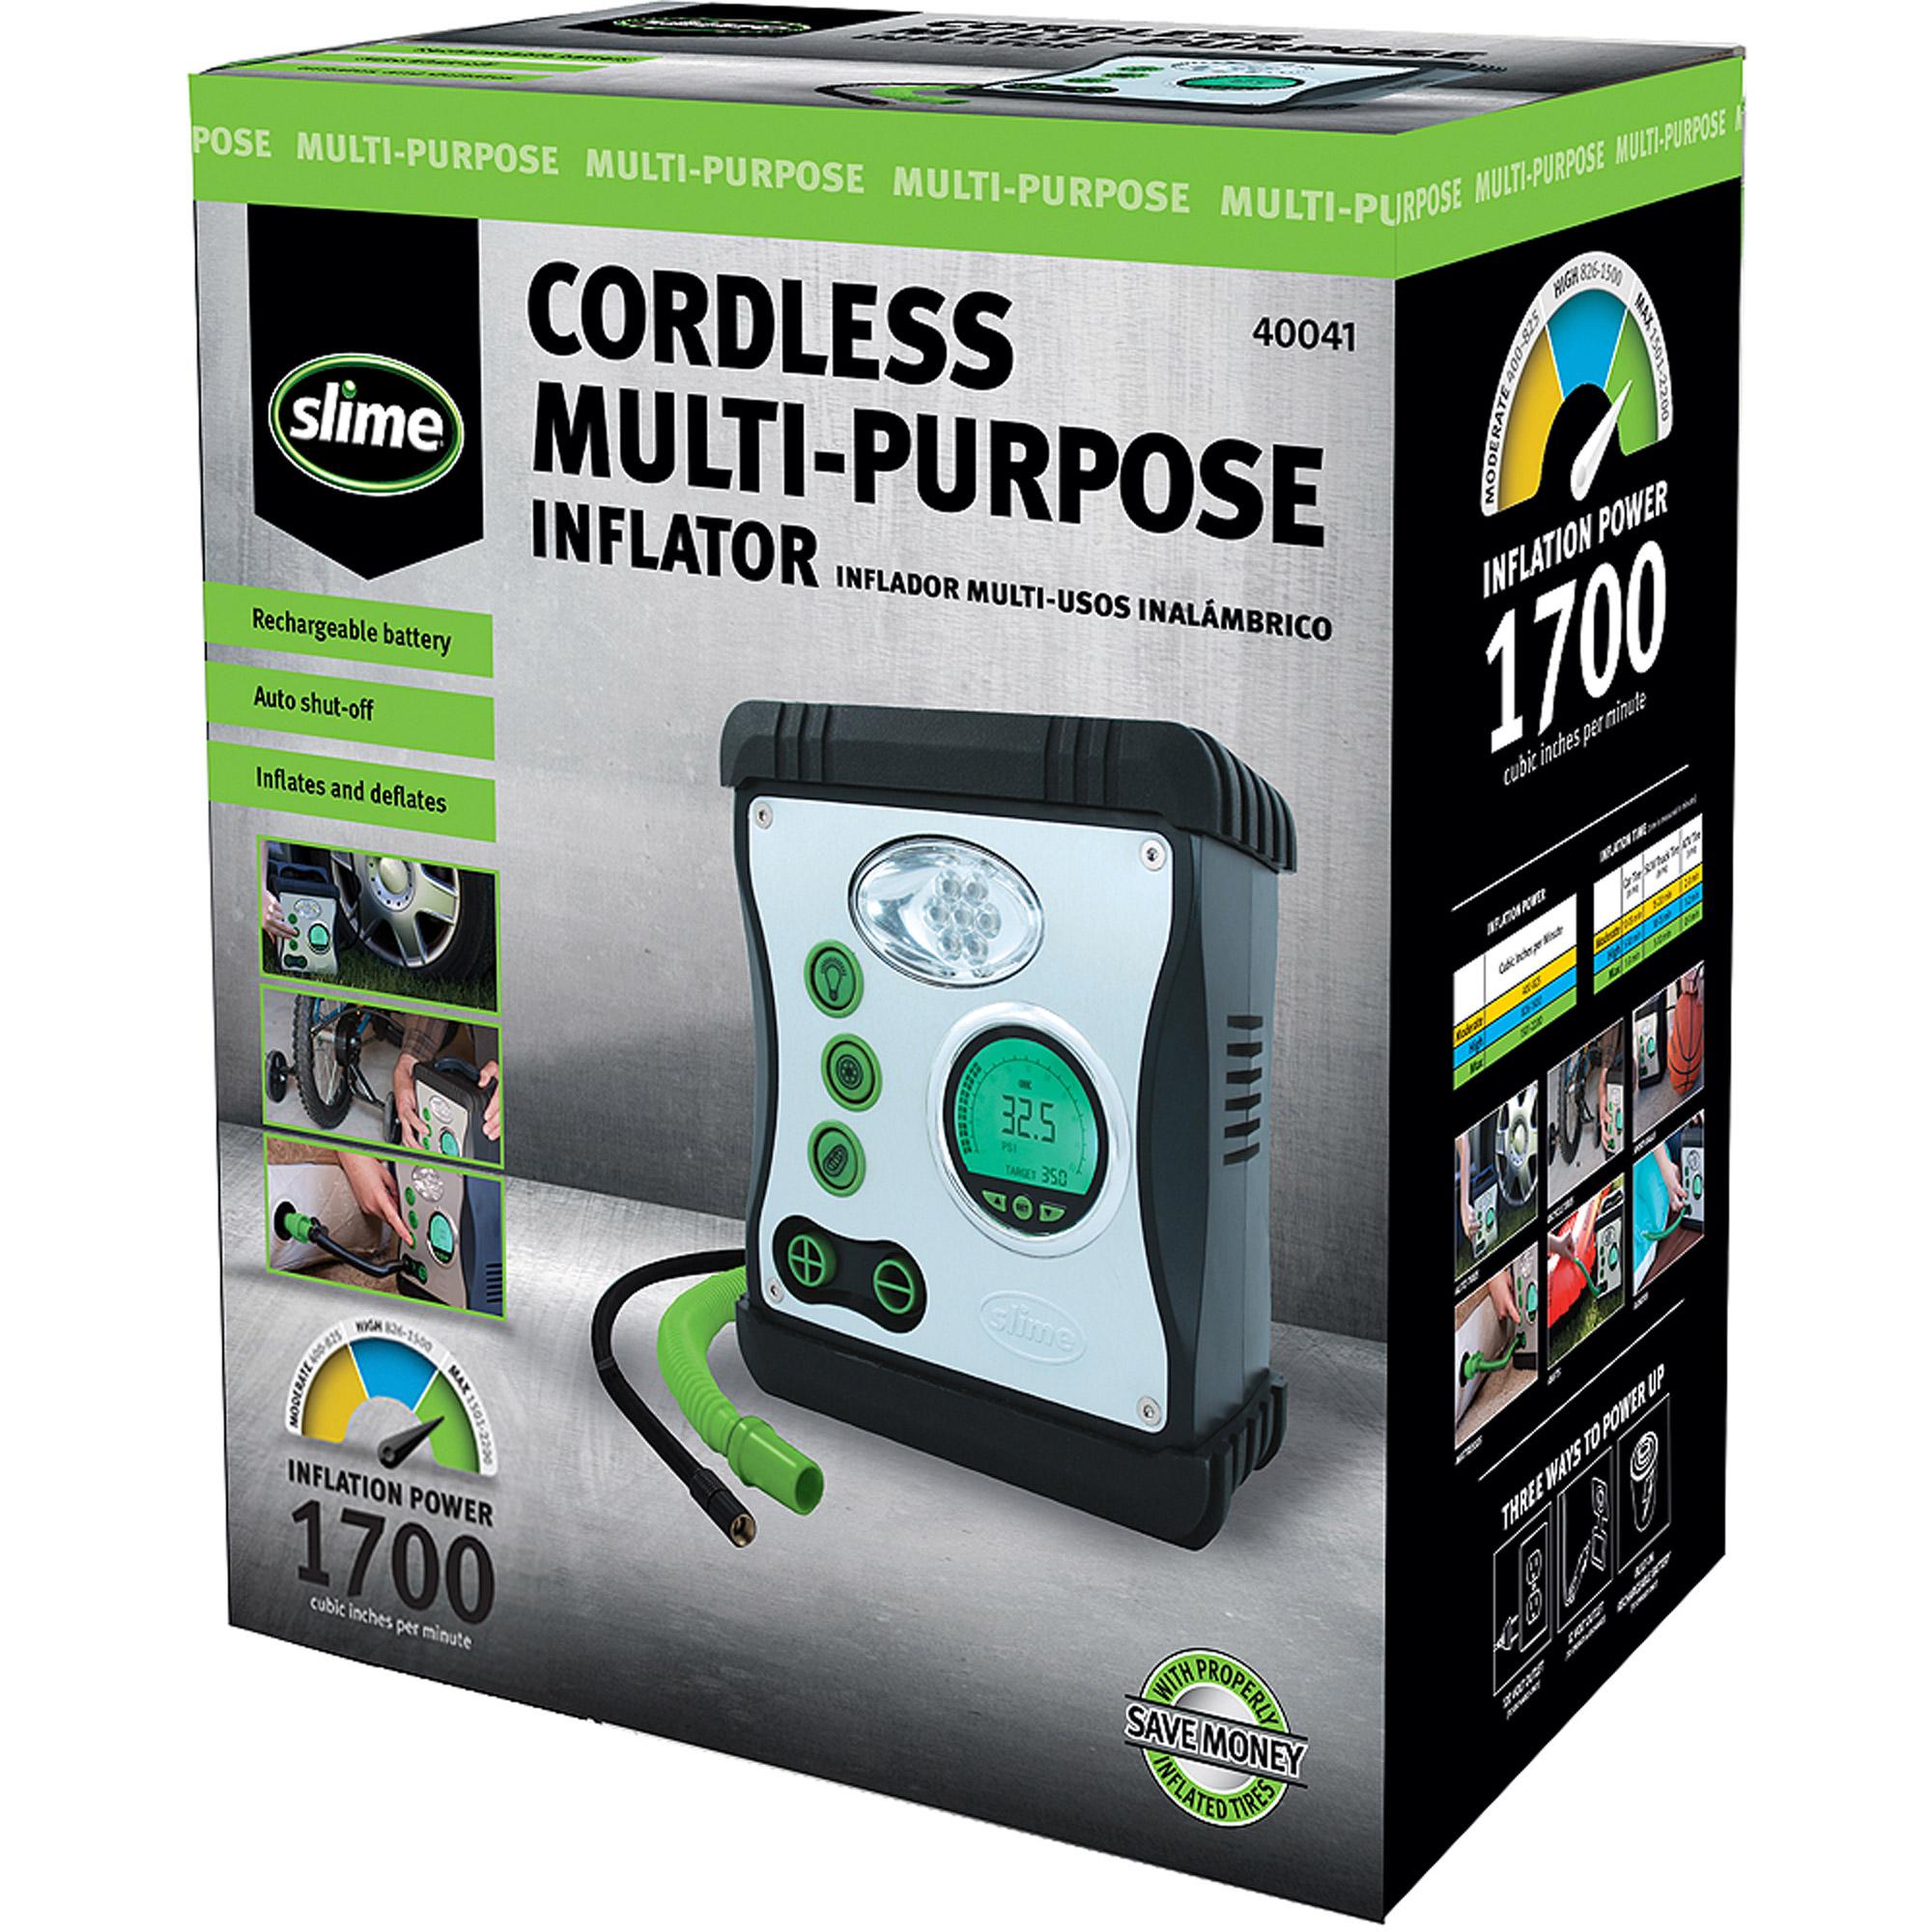 Slime Cordless Multi-Purpose Inflator - 40041